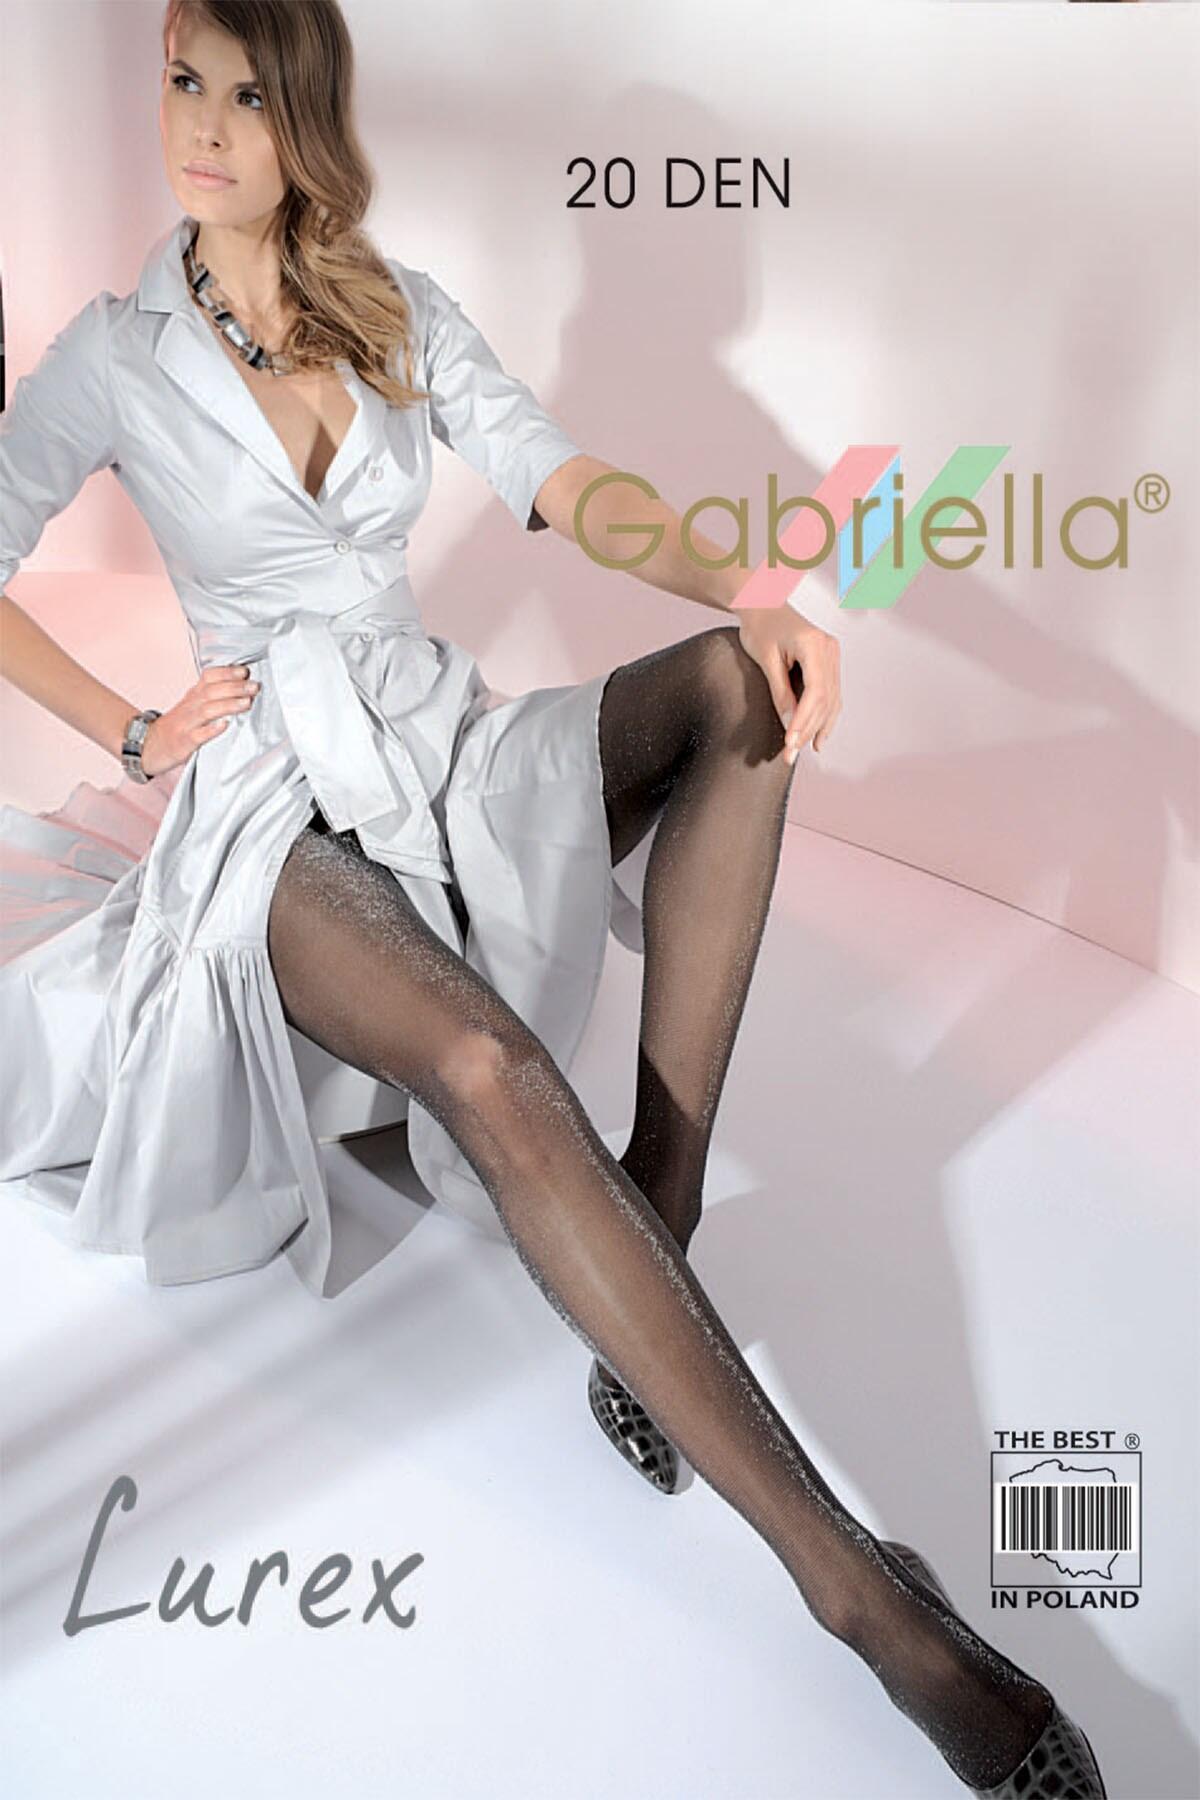 Gabriella Lurex 20 Denier Silky Tight  - Black/Gold